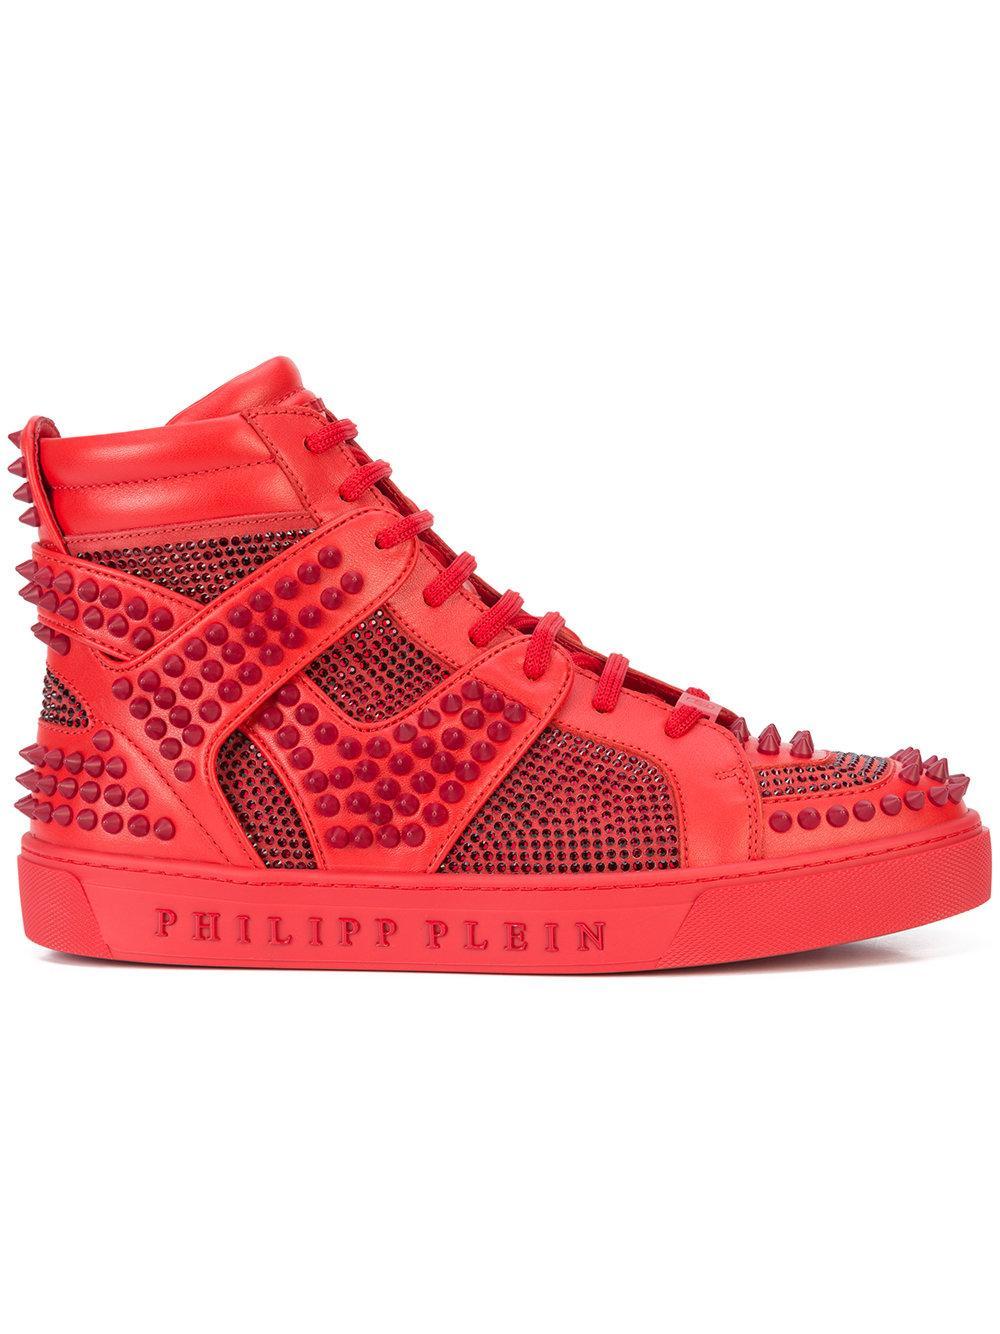 2e20376ef5 Philipp Plein Don'T Wake Me Up Hi-Top Sneakers | ModeSens